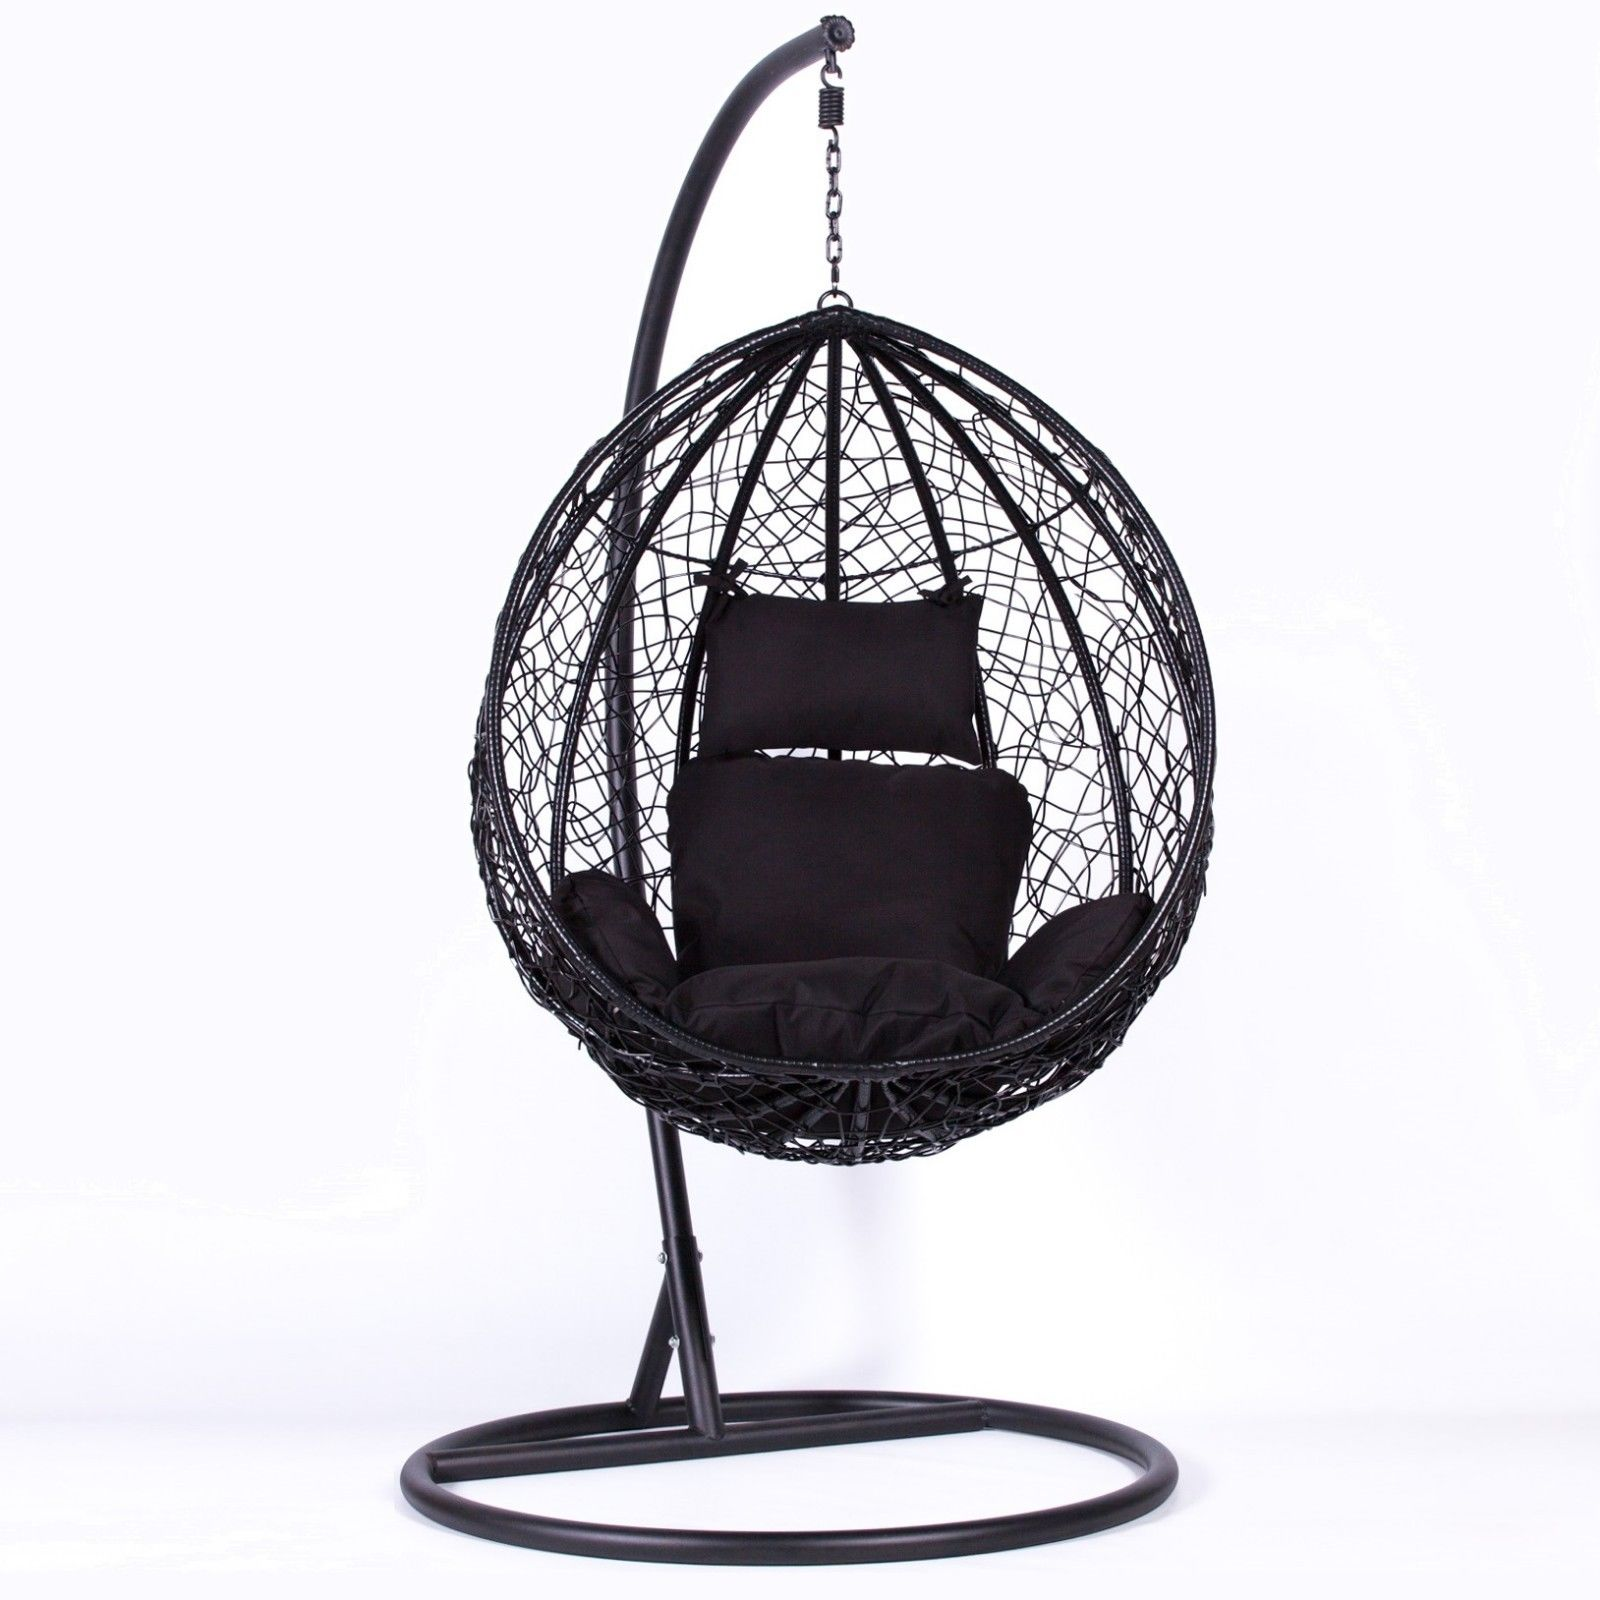 Rattan Black Swing Weave Patio Garden Hanging Egg Chair Furniture La Maison Chic Luxury Interiors